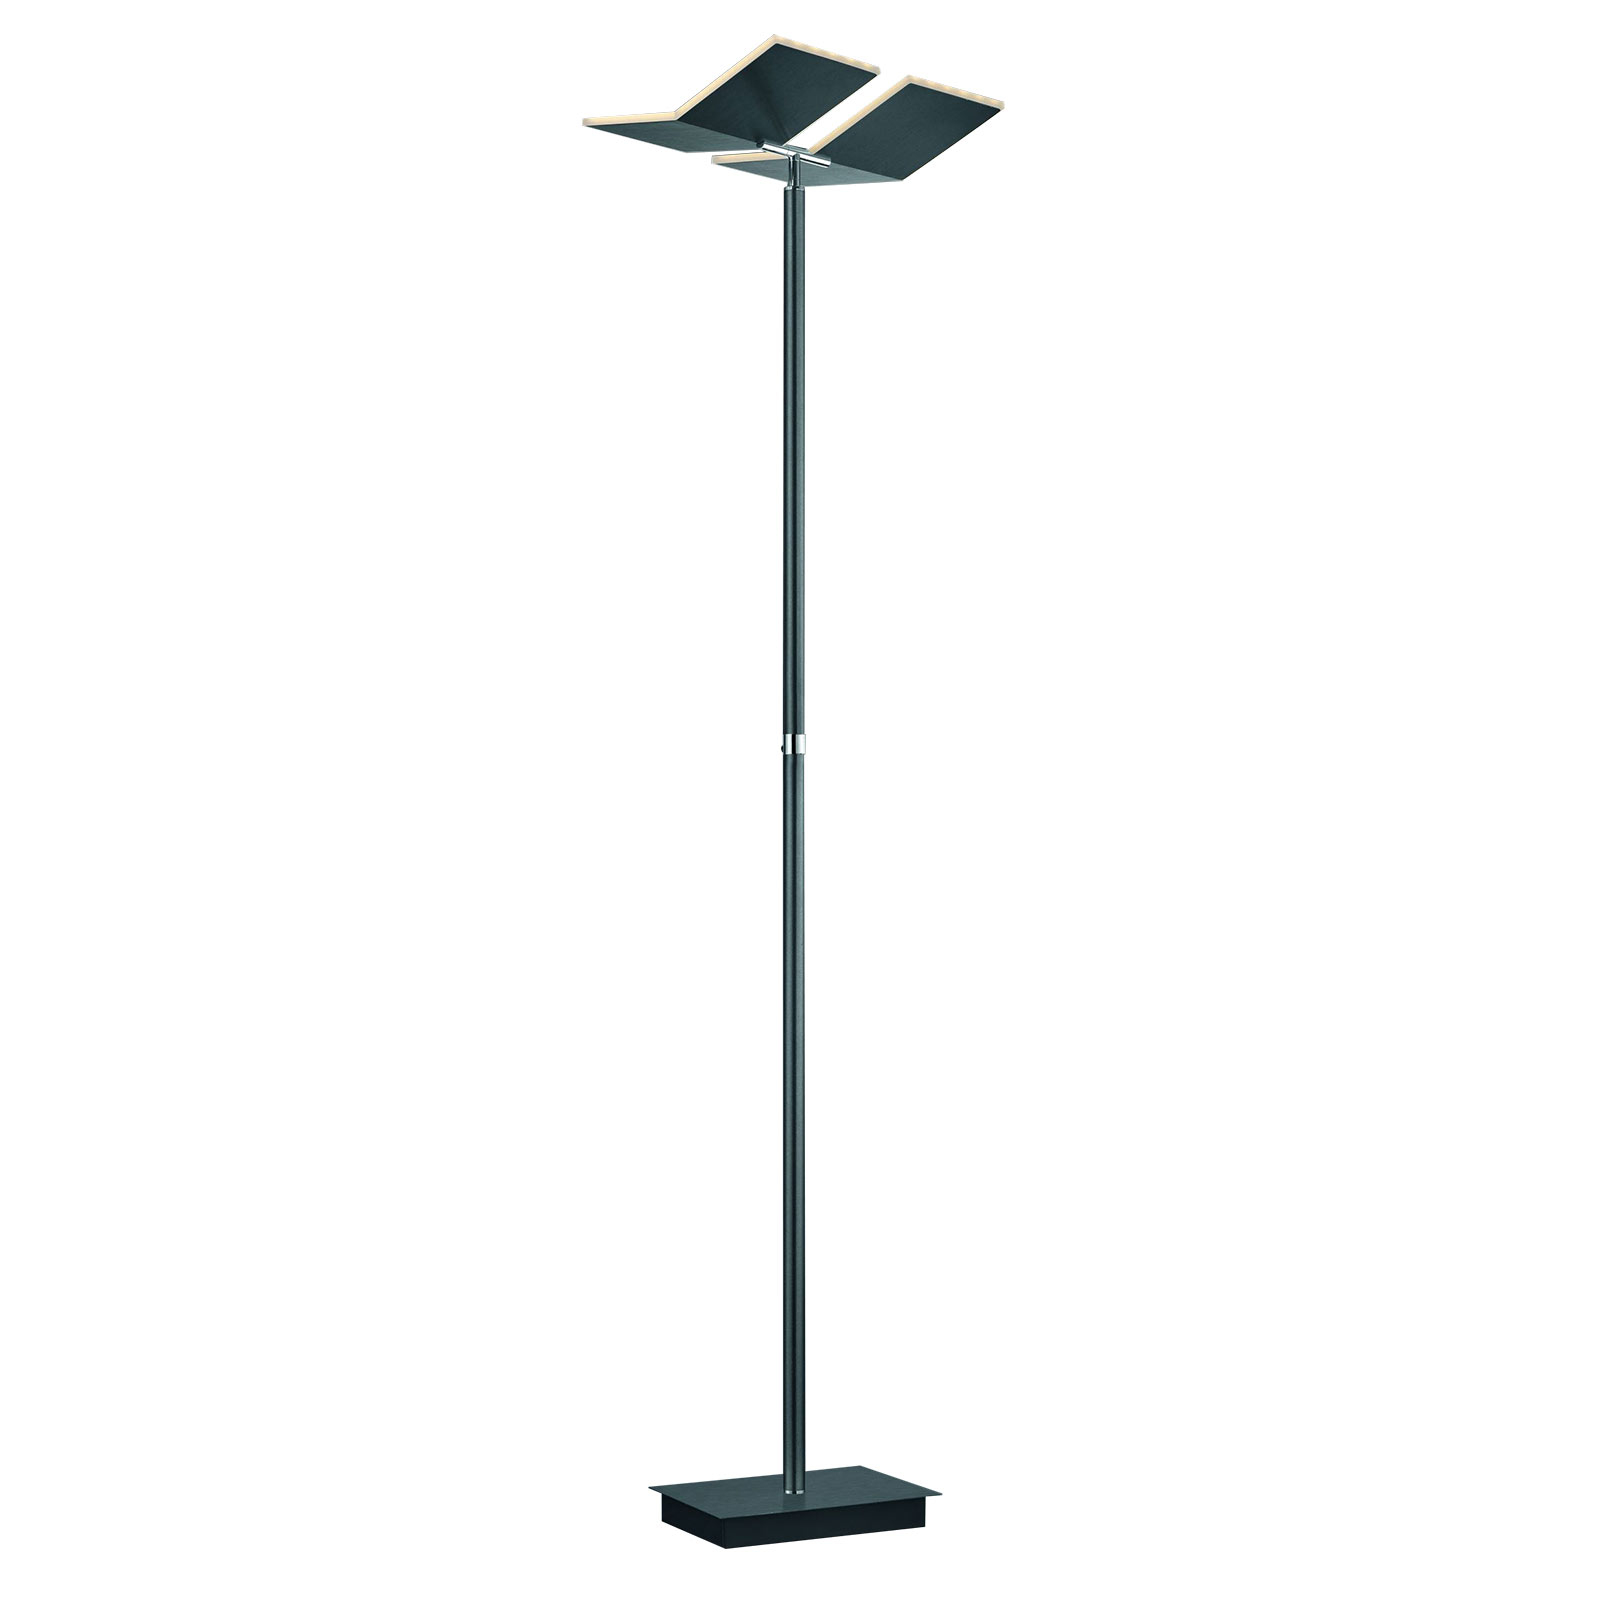 B-Leuchten Domi lampadaire LED, anthracite